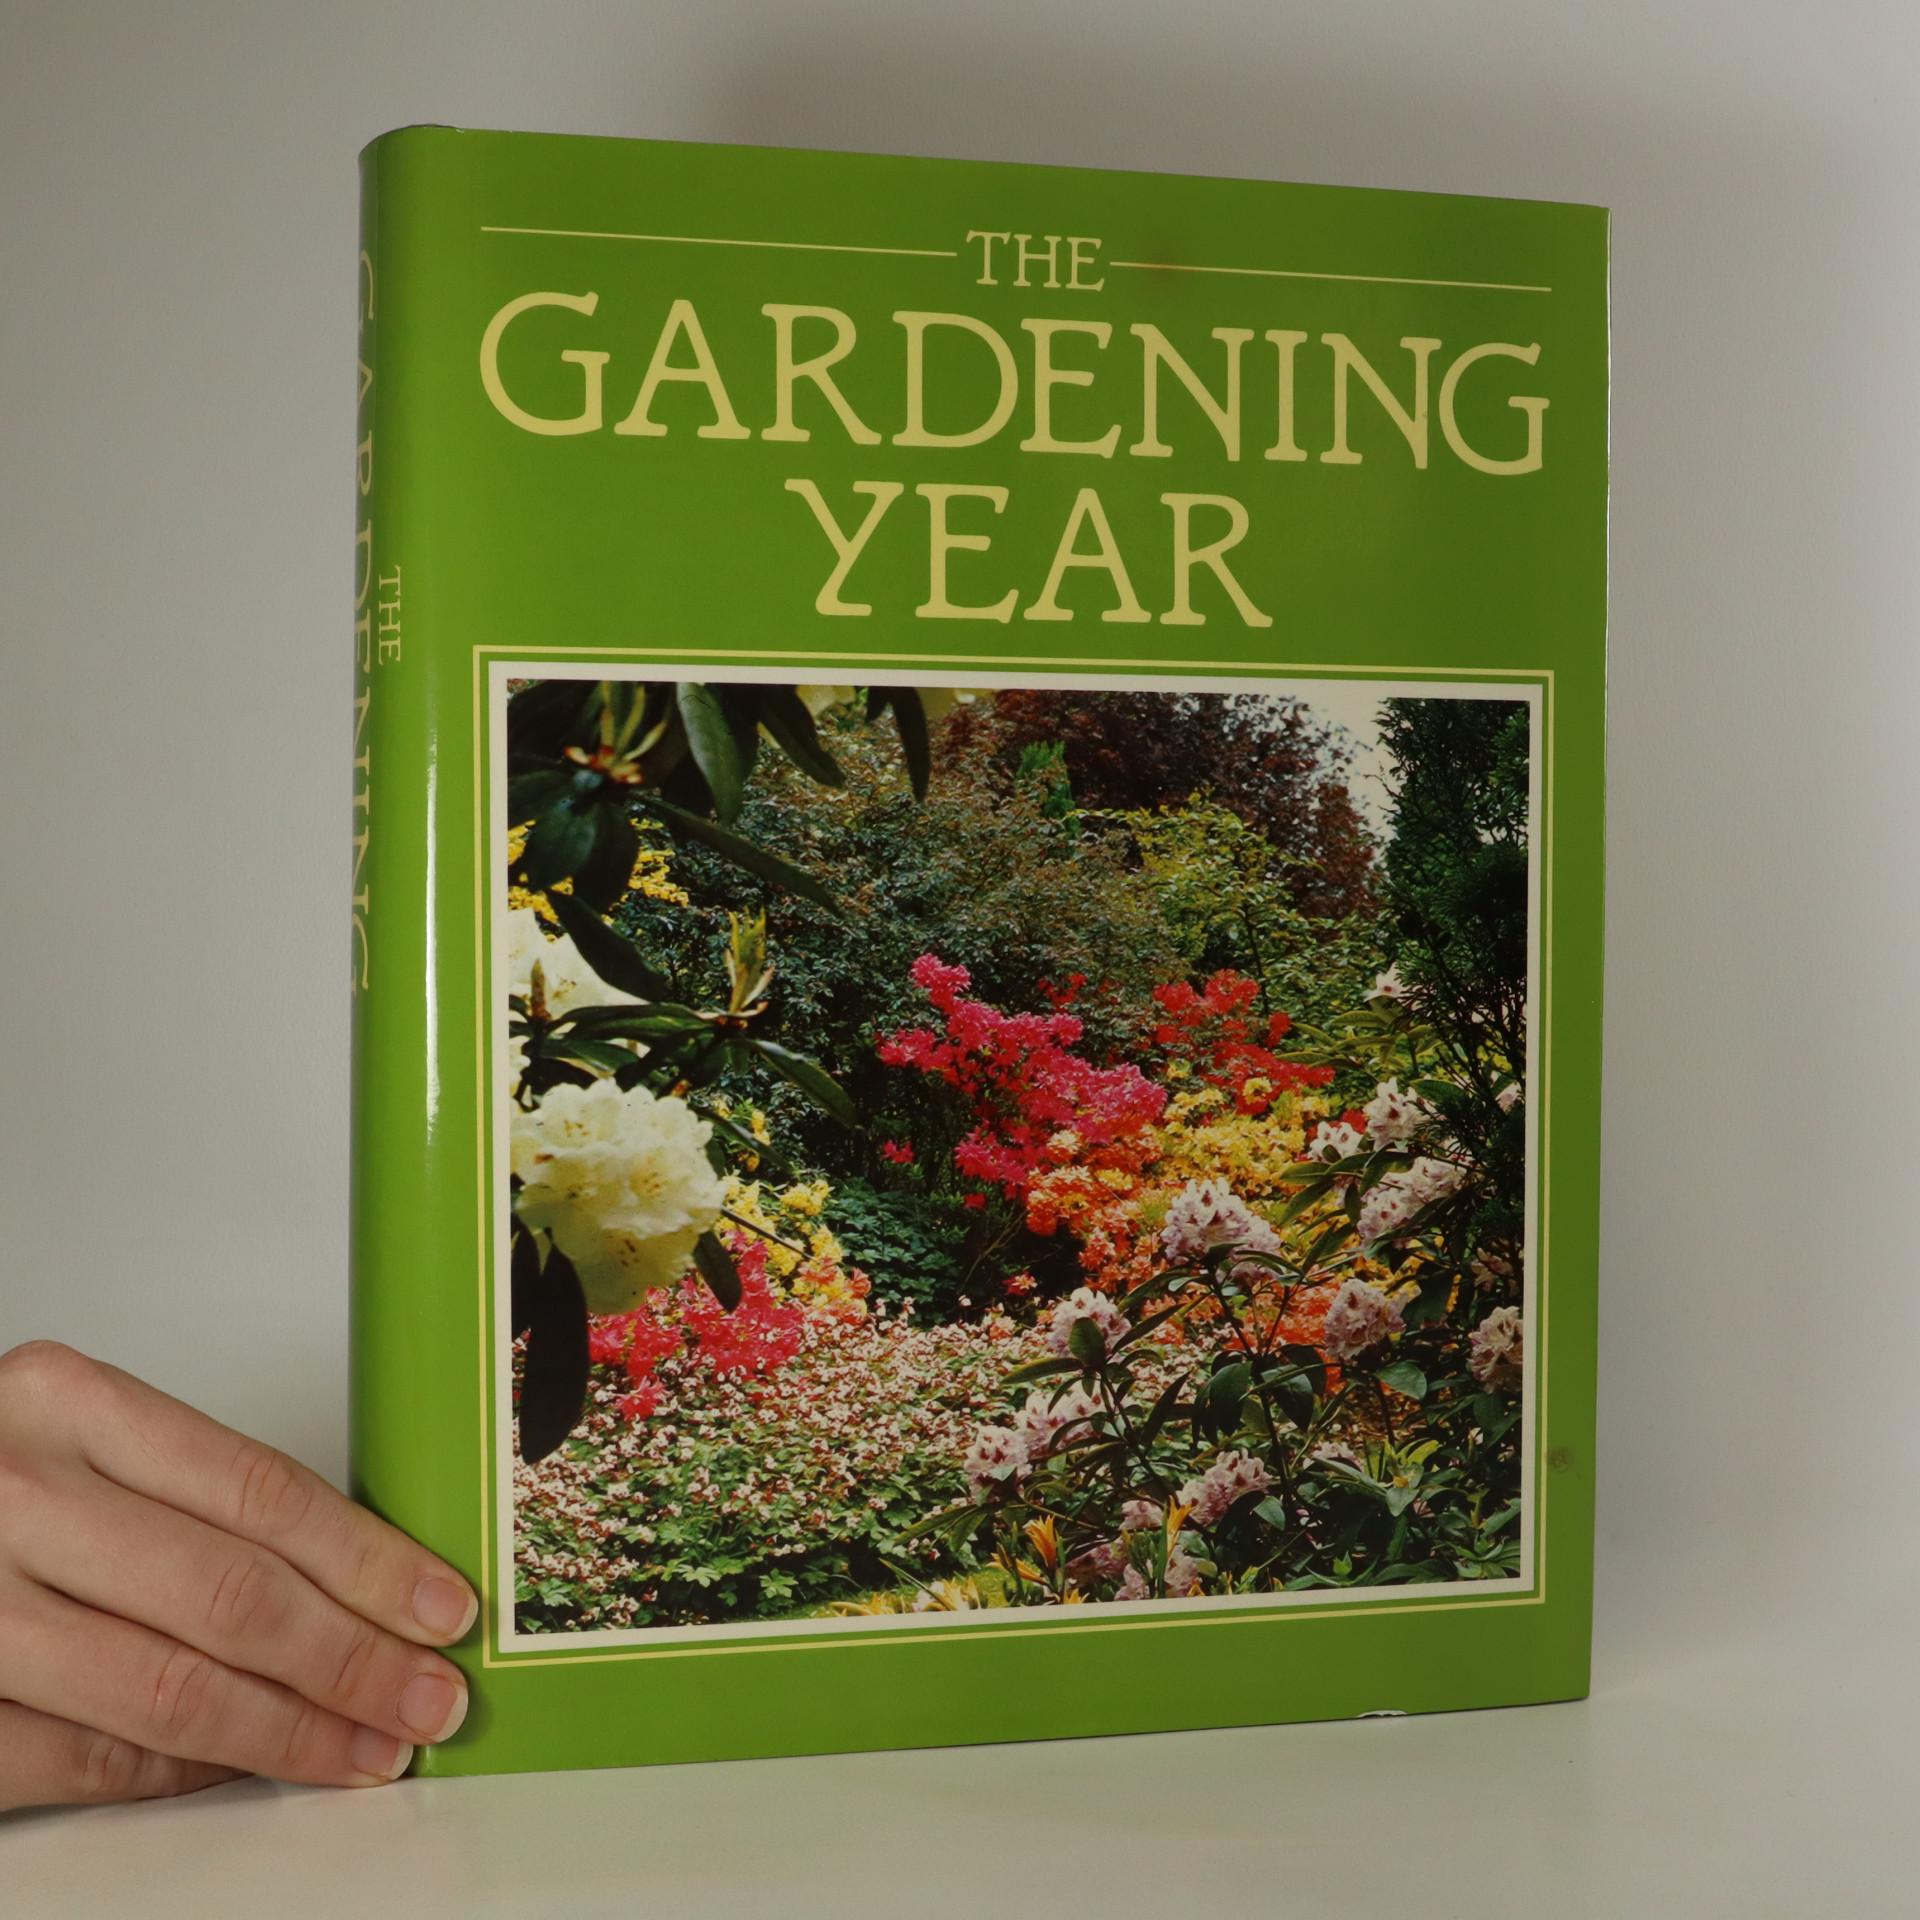 antikvární kniha The Gardening Year, 1985